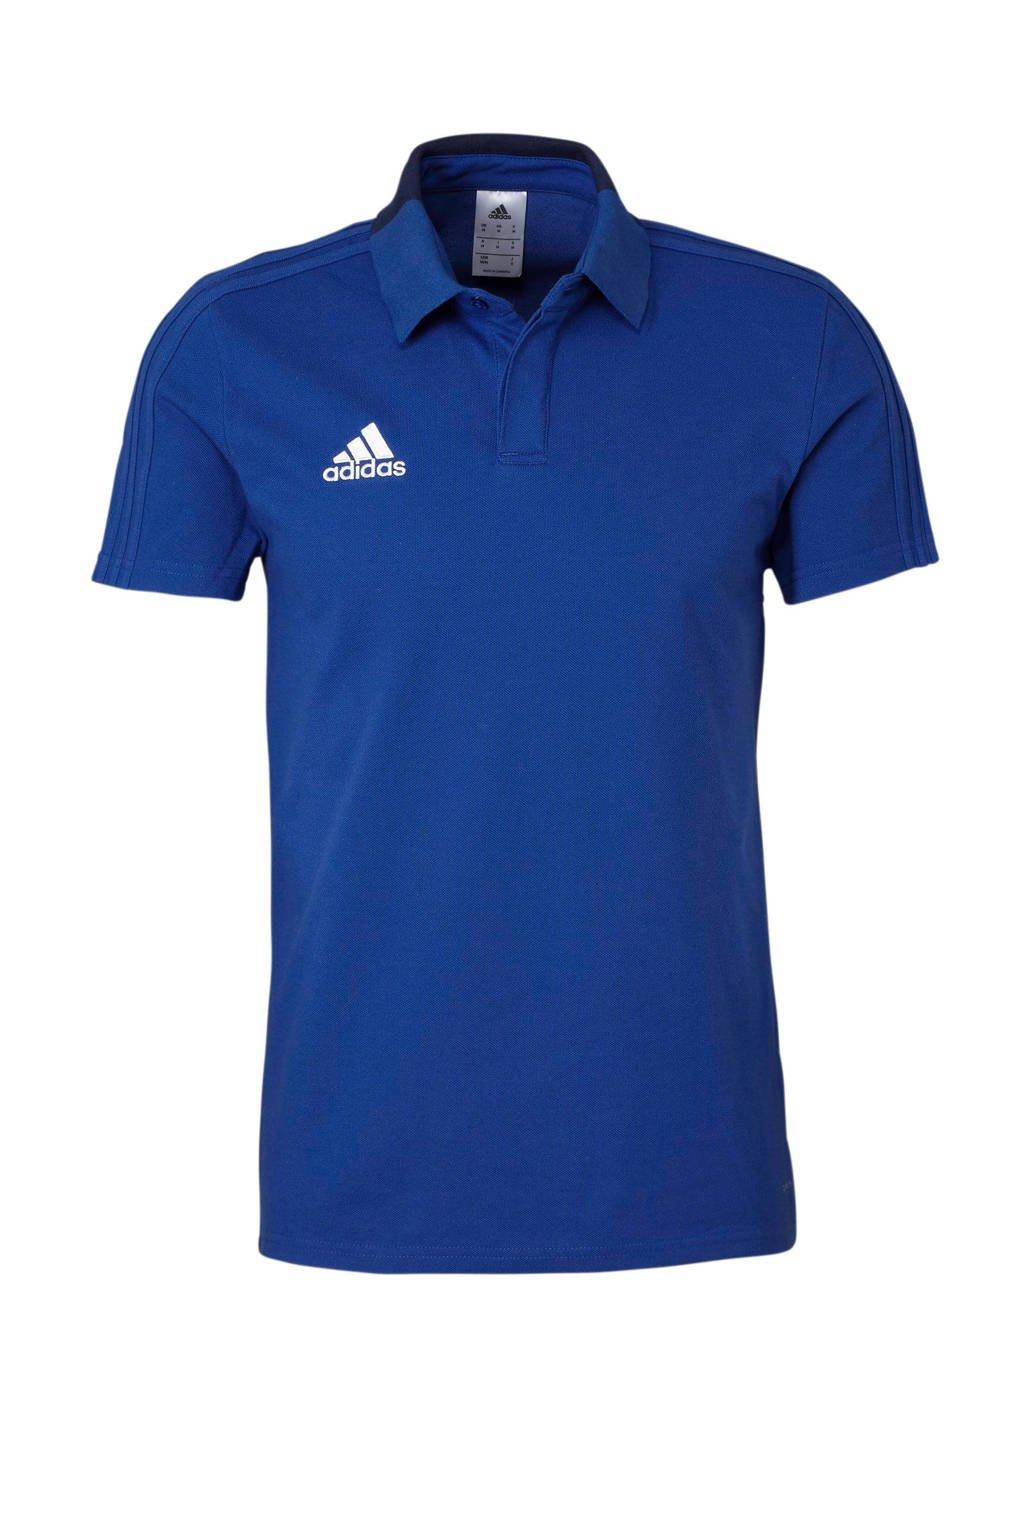 adidas performance   sportpolo Con18 blauw, Blauw